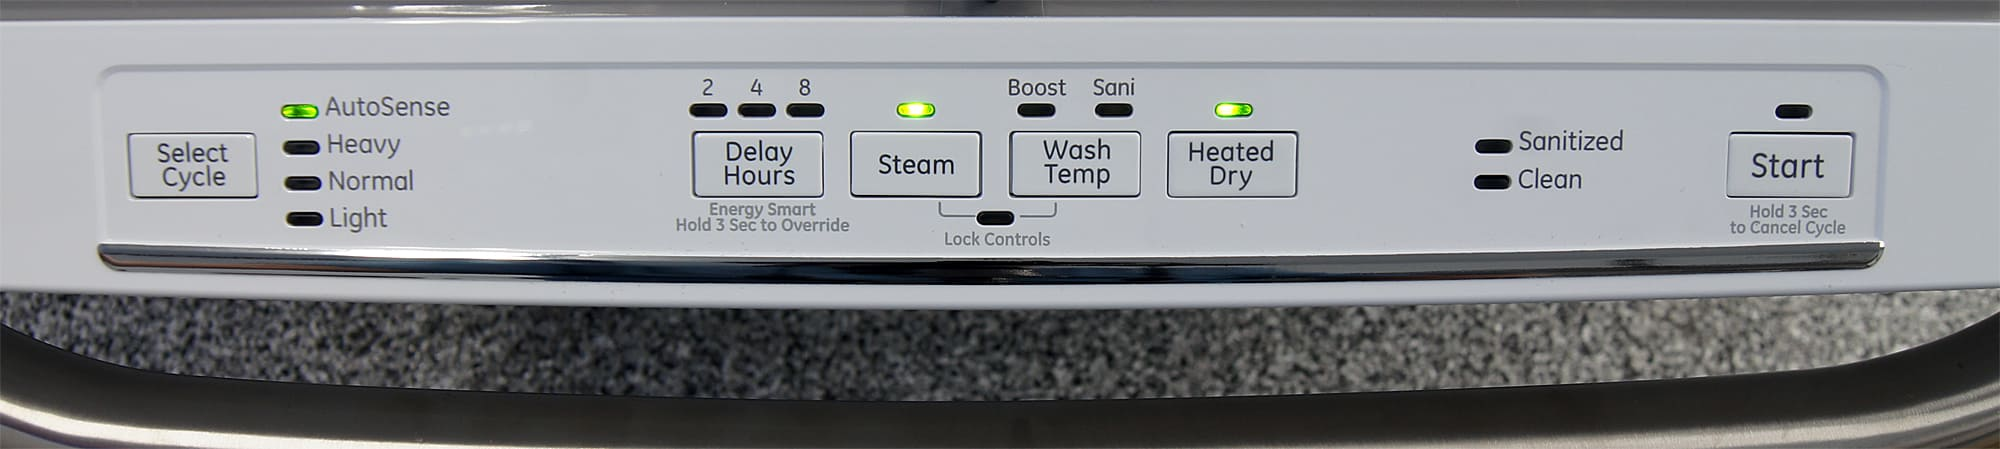 GE Artistry ADT521PGFWS controls